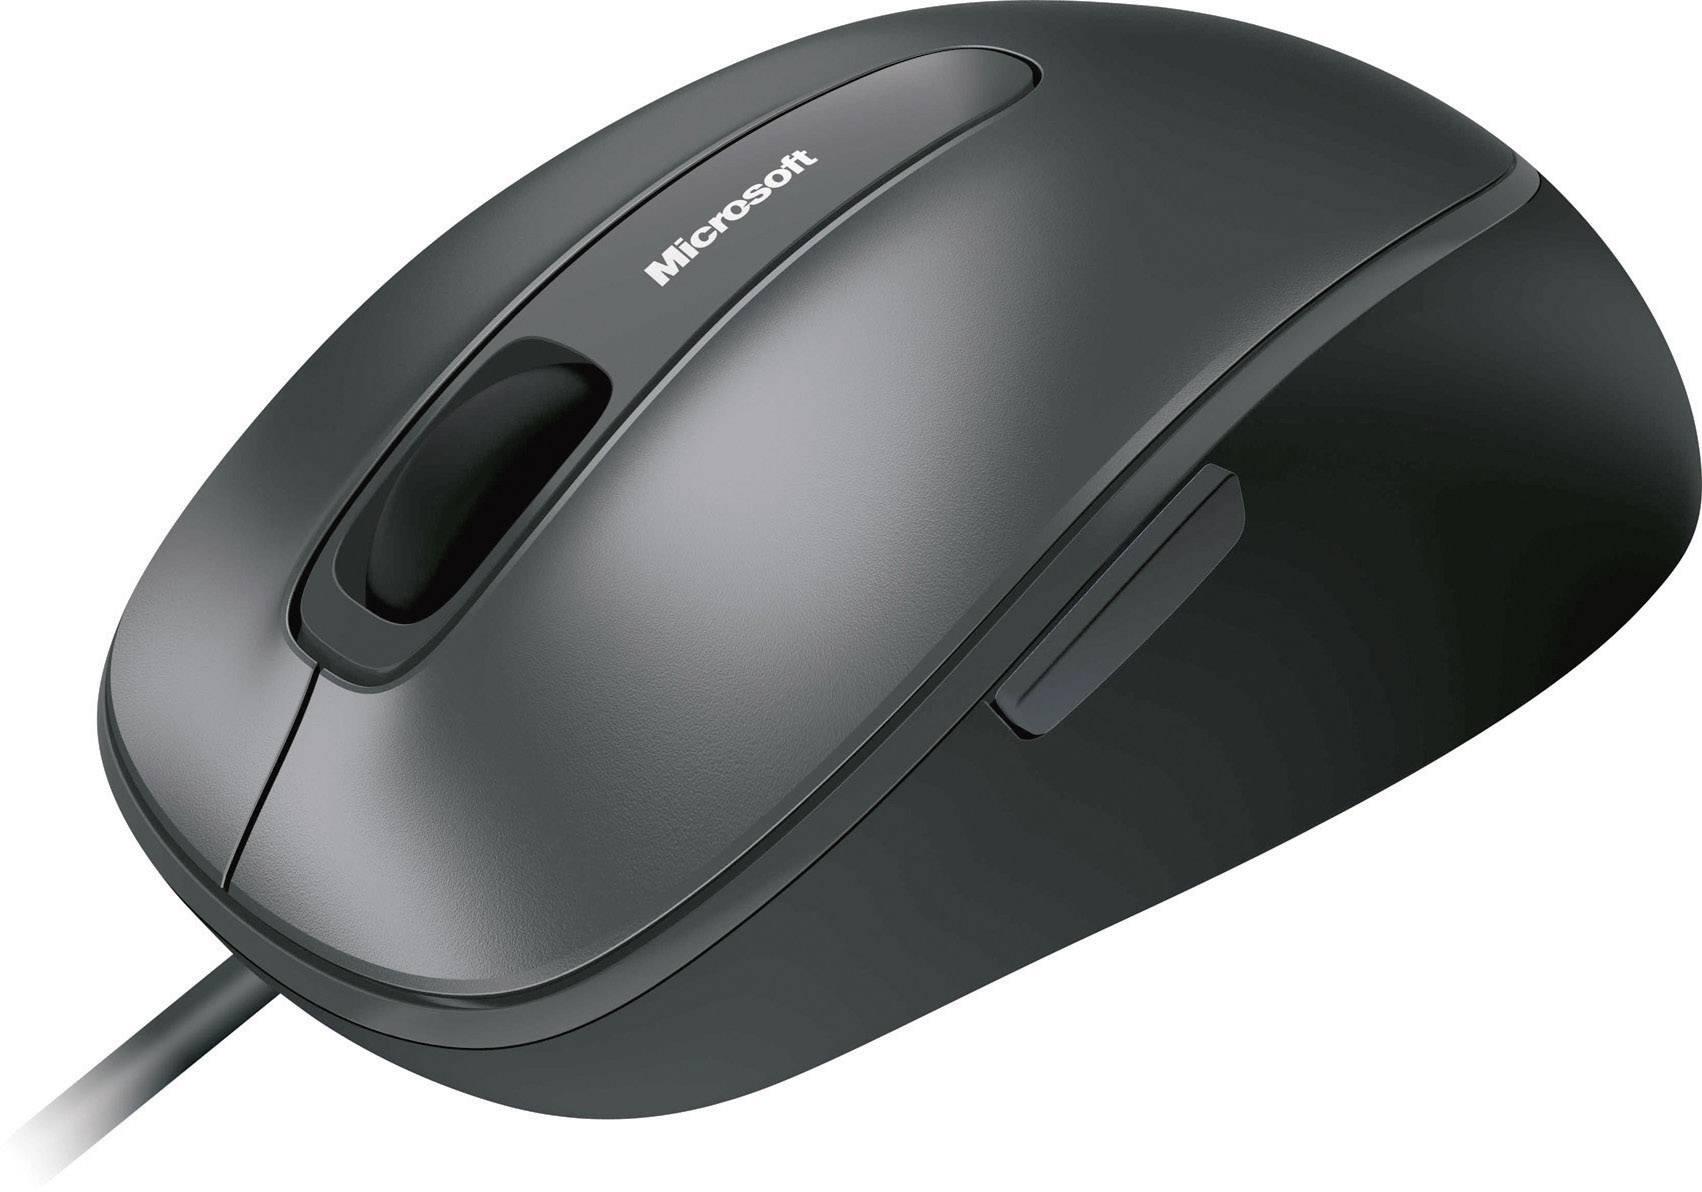 Optická USB myš Microsoft Comfort Mouse 4500 4FD-00023, čierna